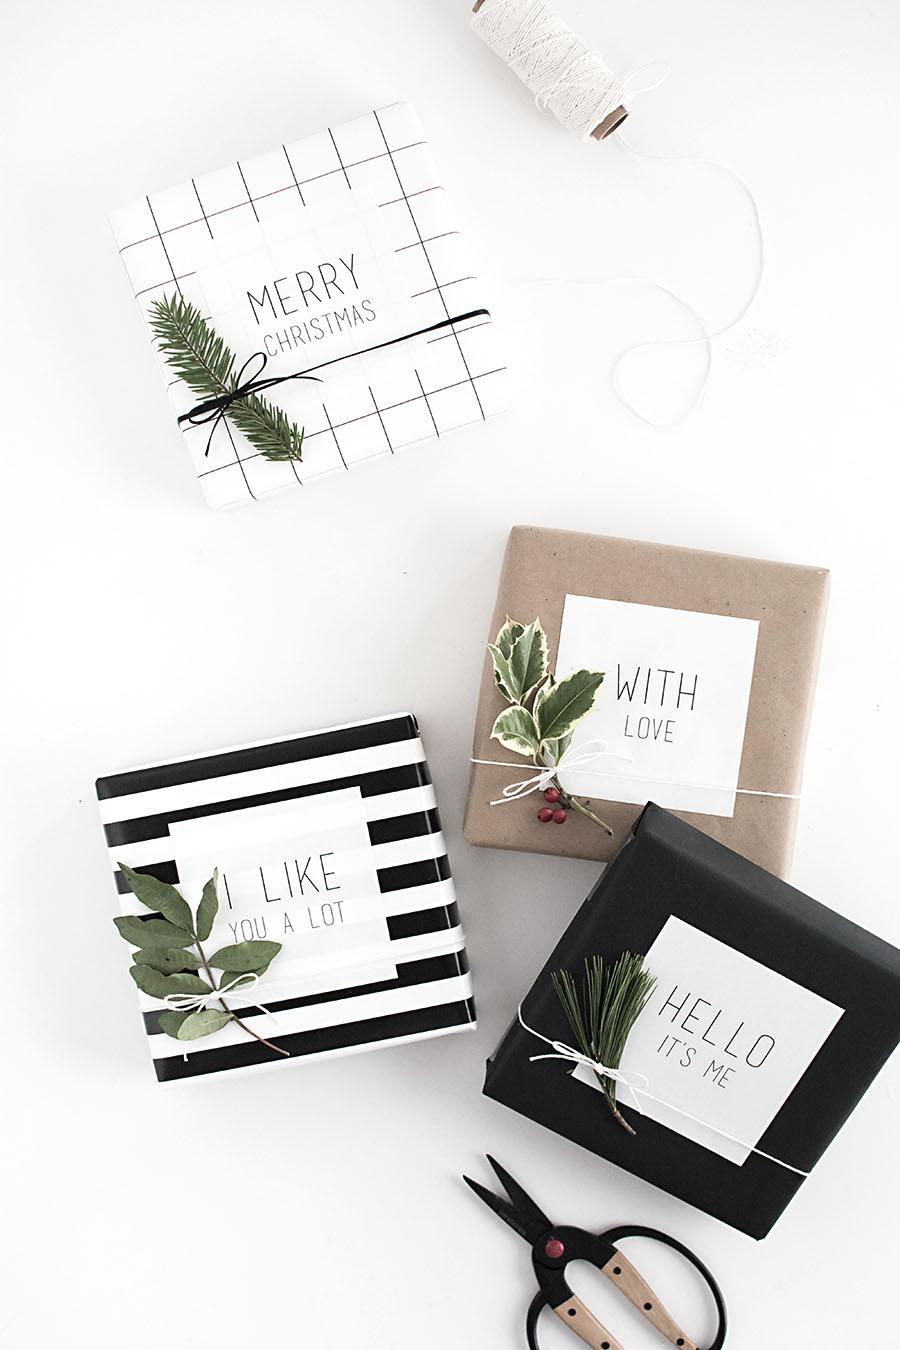 How To Wrap Christmas Gift